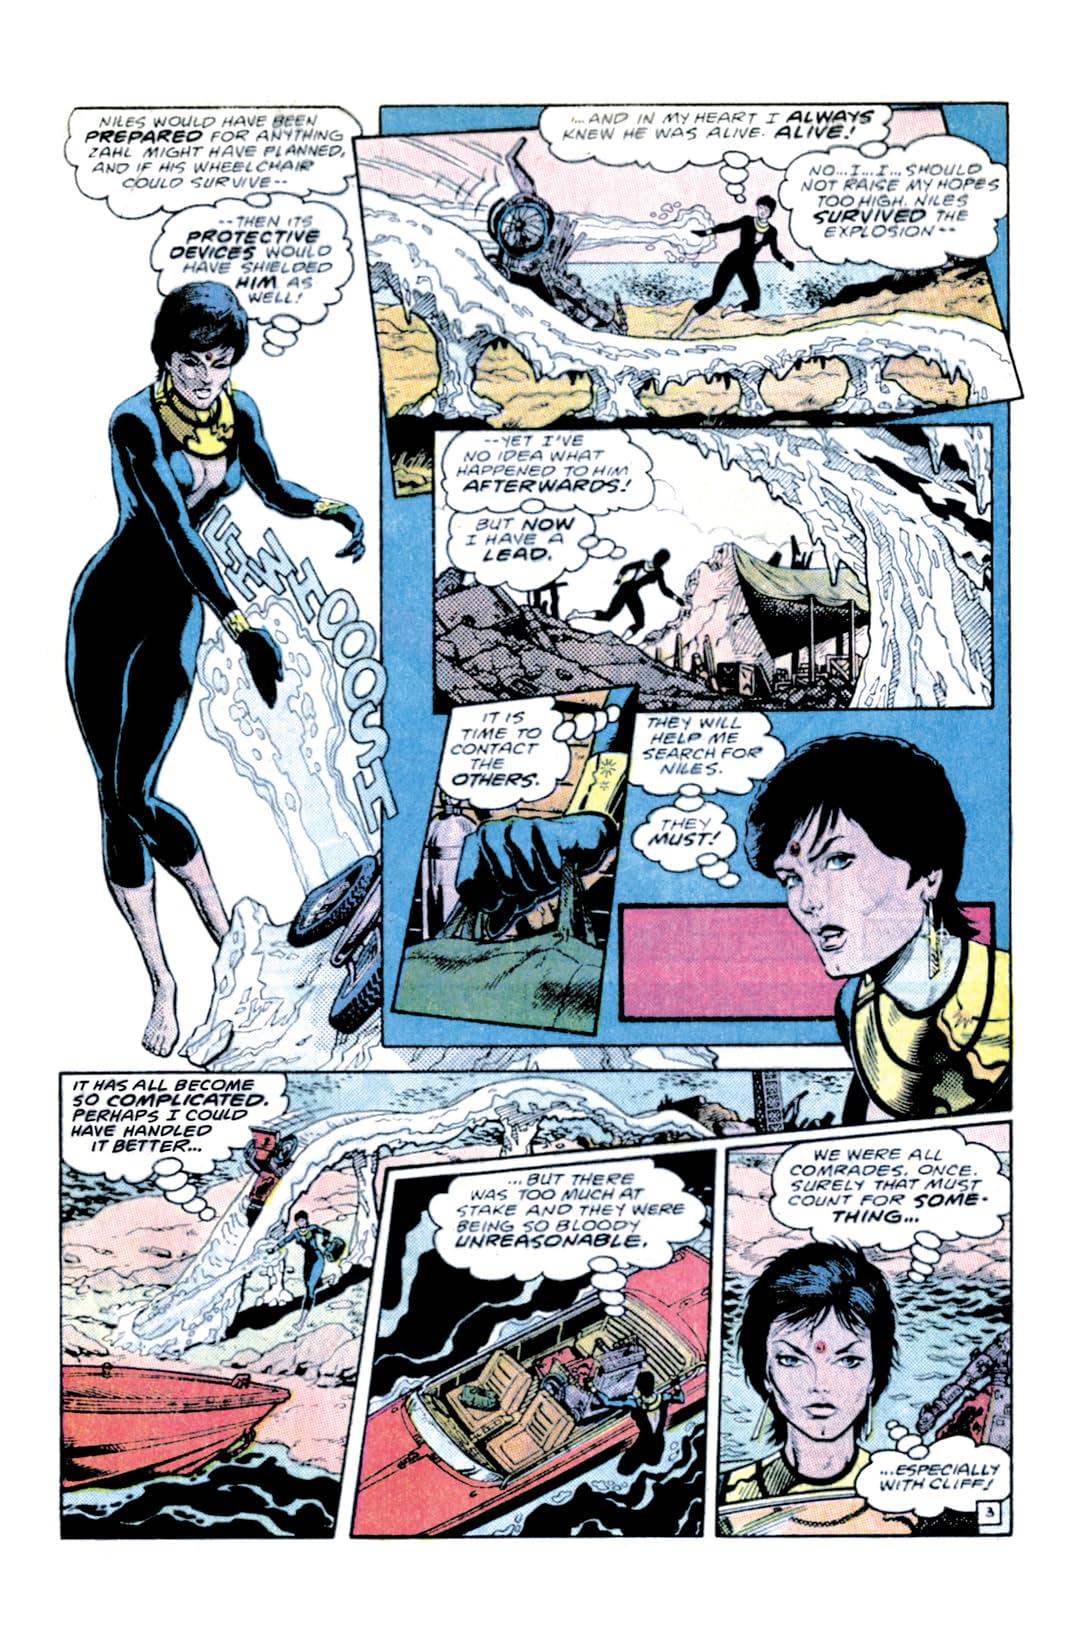 Doom Patrol (1987-1995) #1